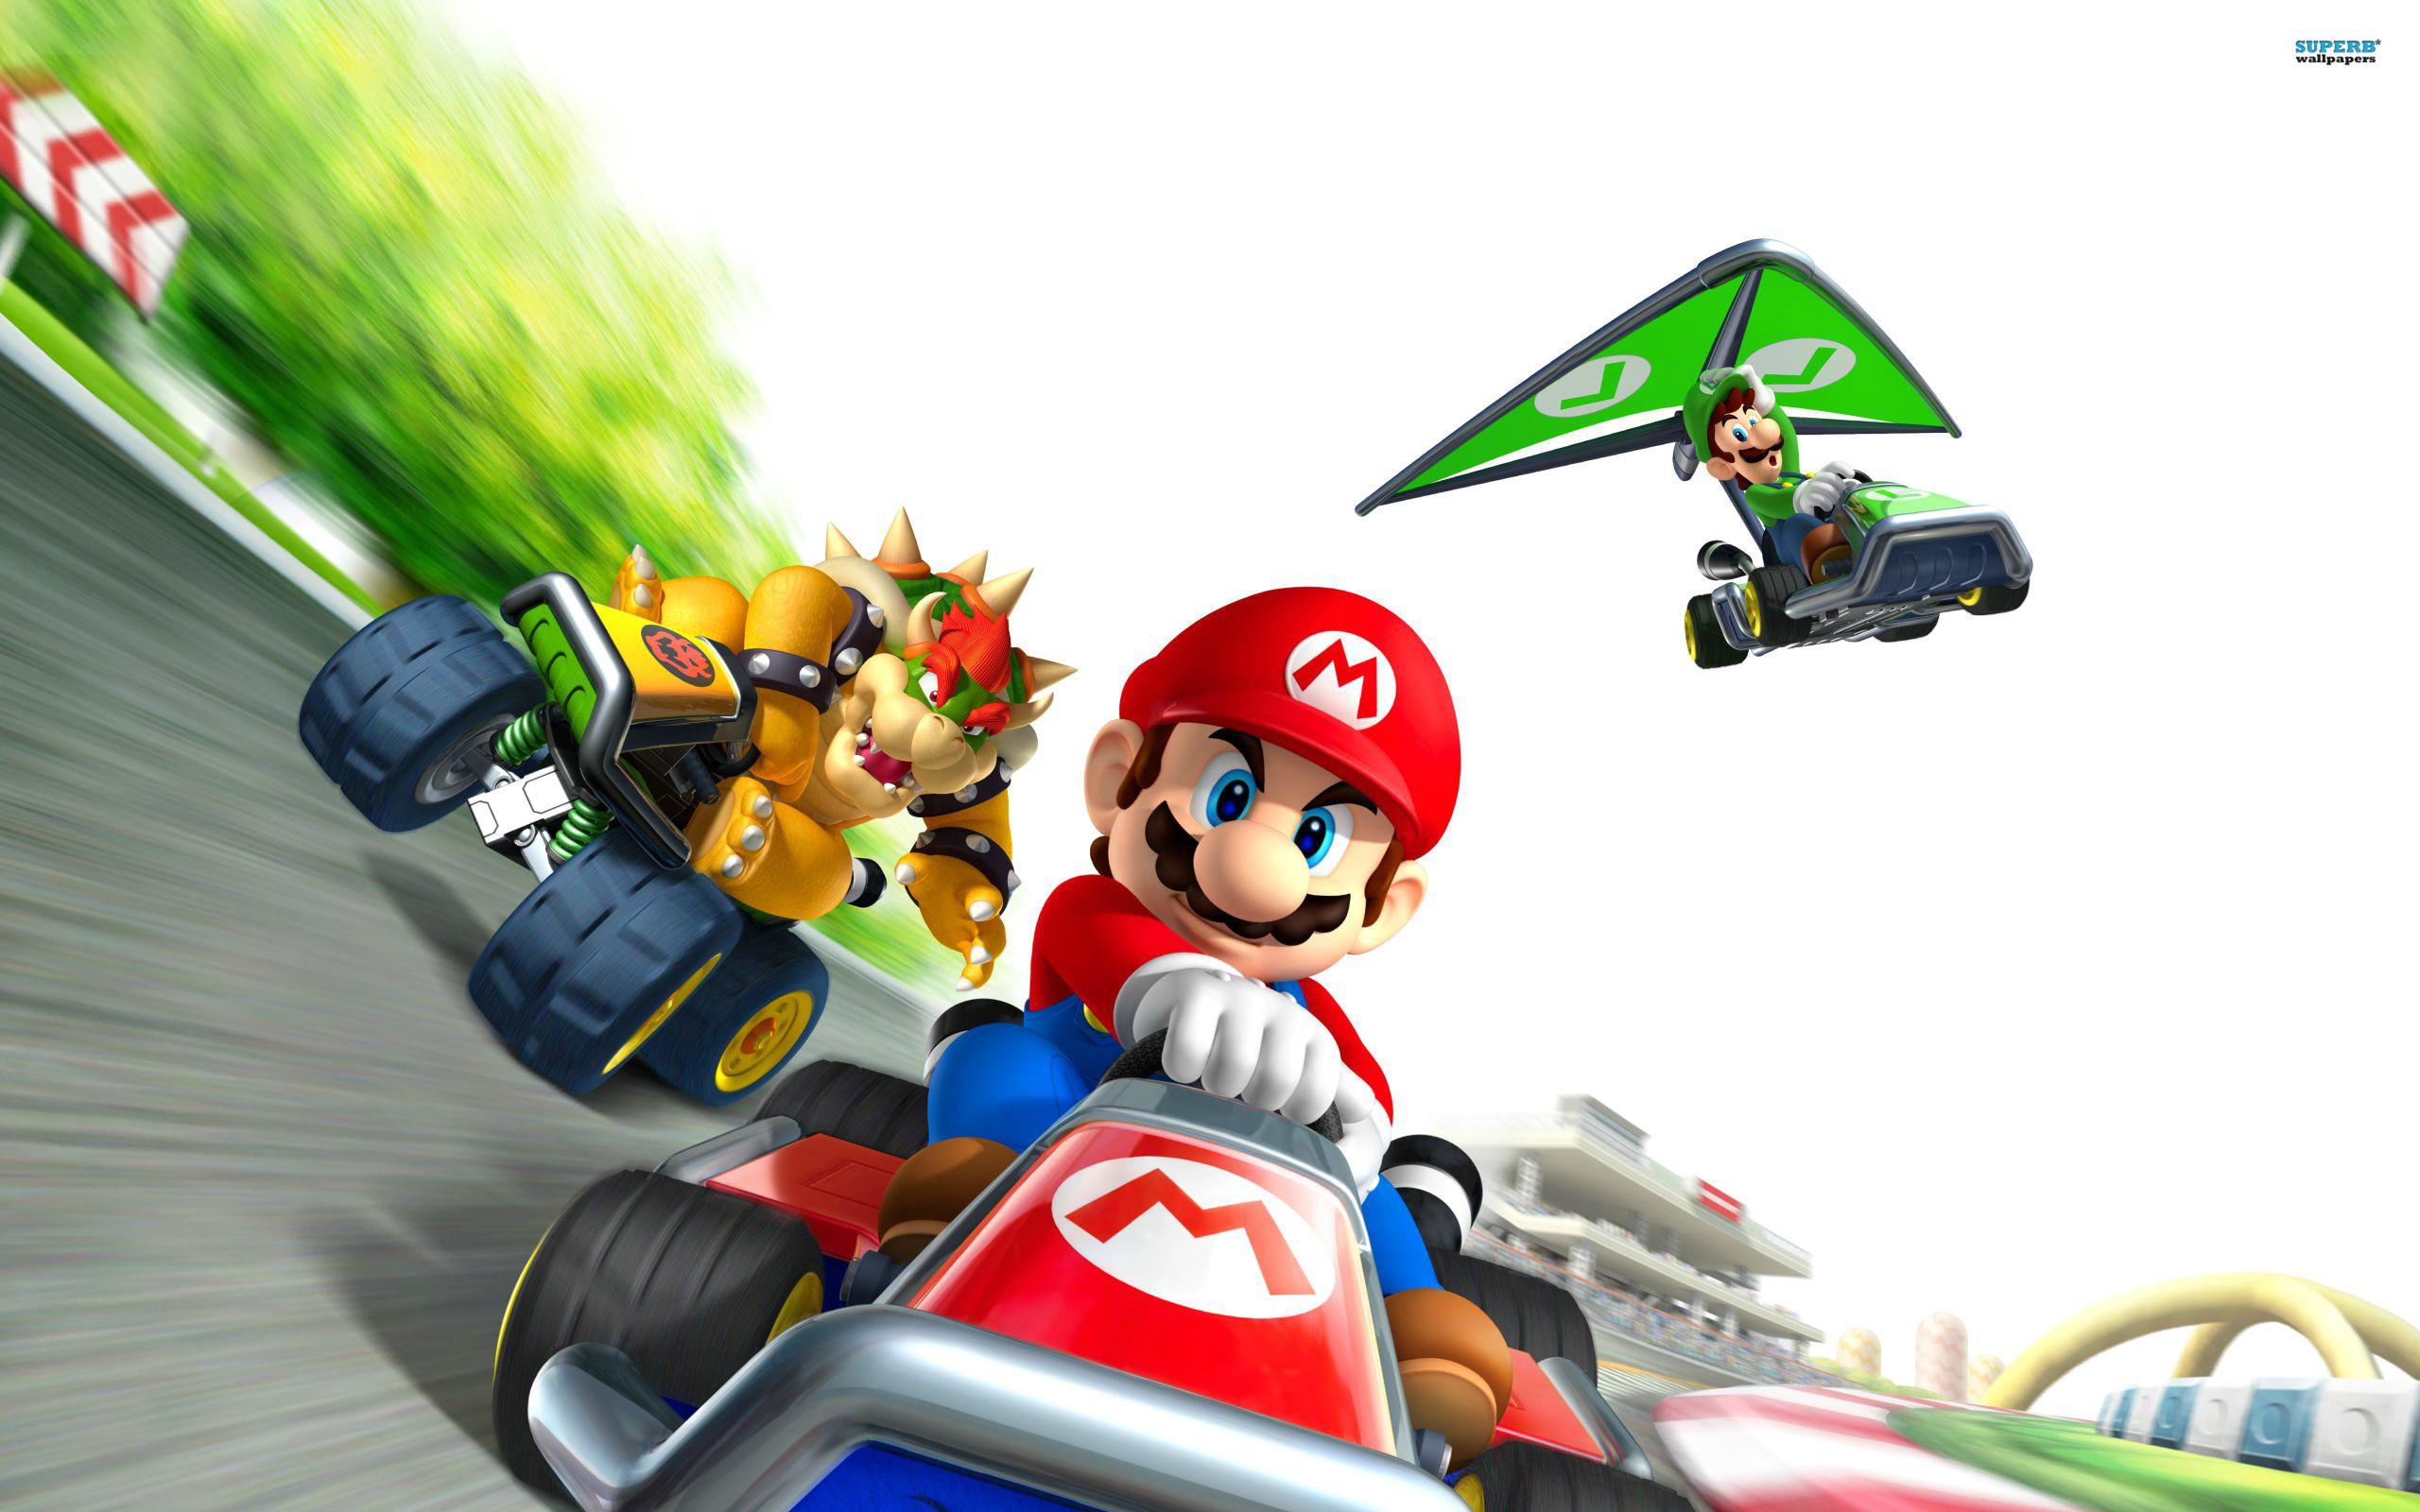 Game Boy Advance Mario Kart Super Circuit Track Backgrounds | HD Wallpapers  | Pinterest | Mario kart and Wallpaper